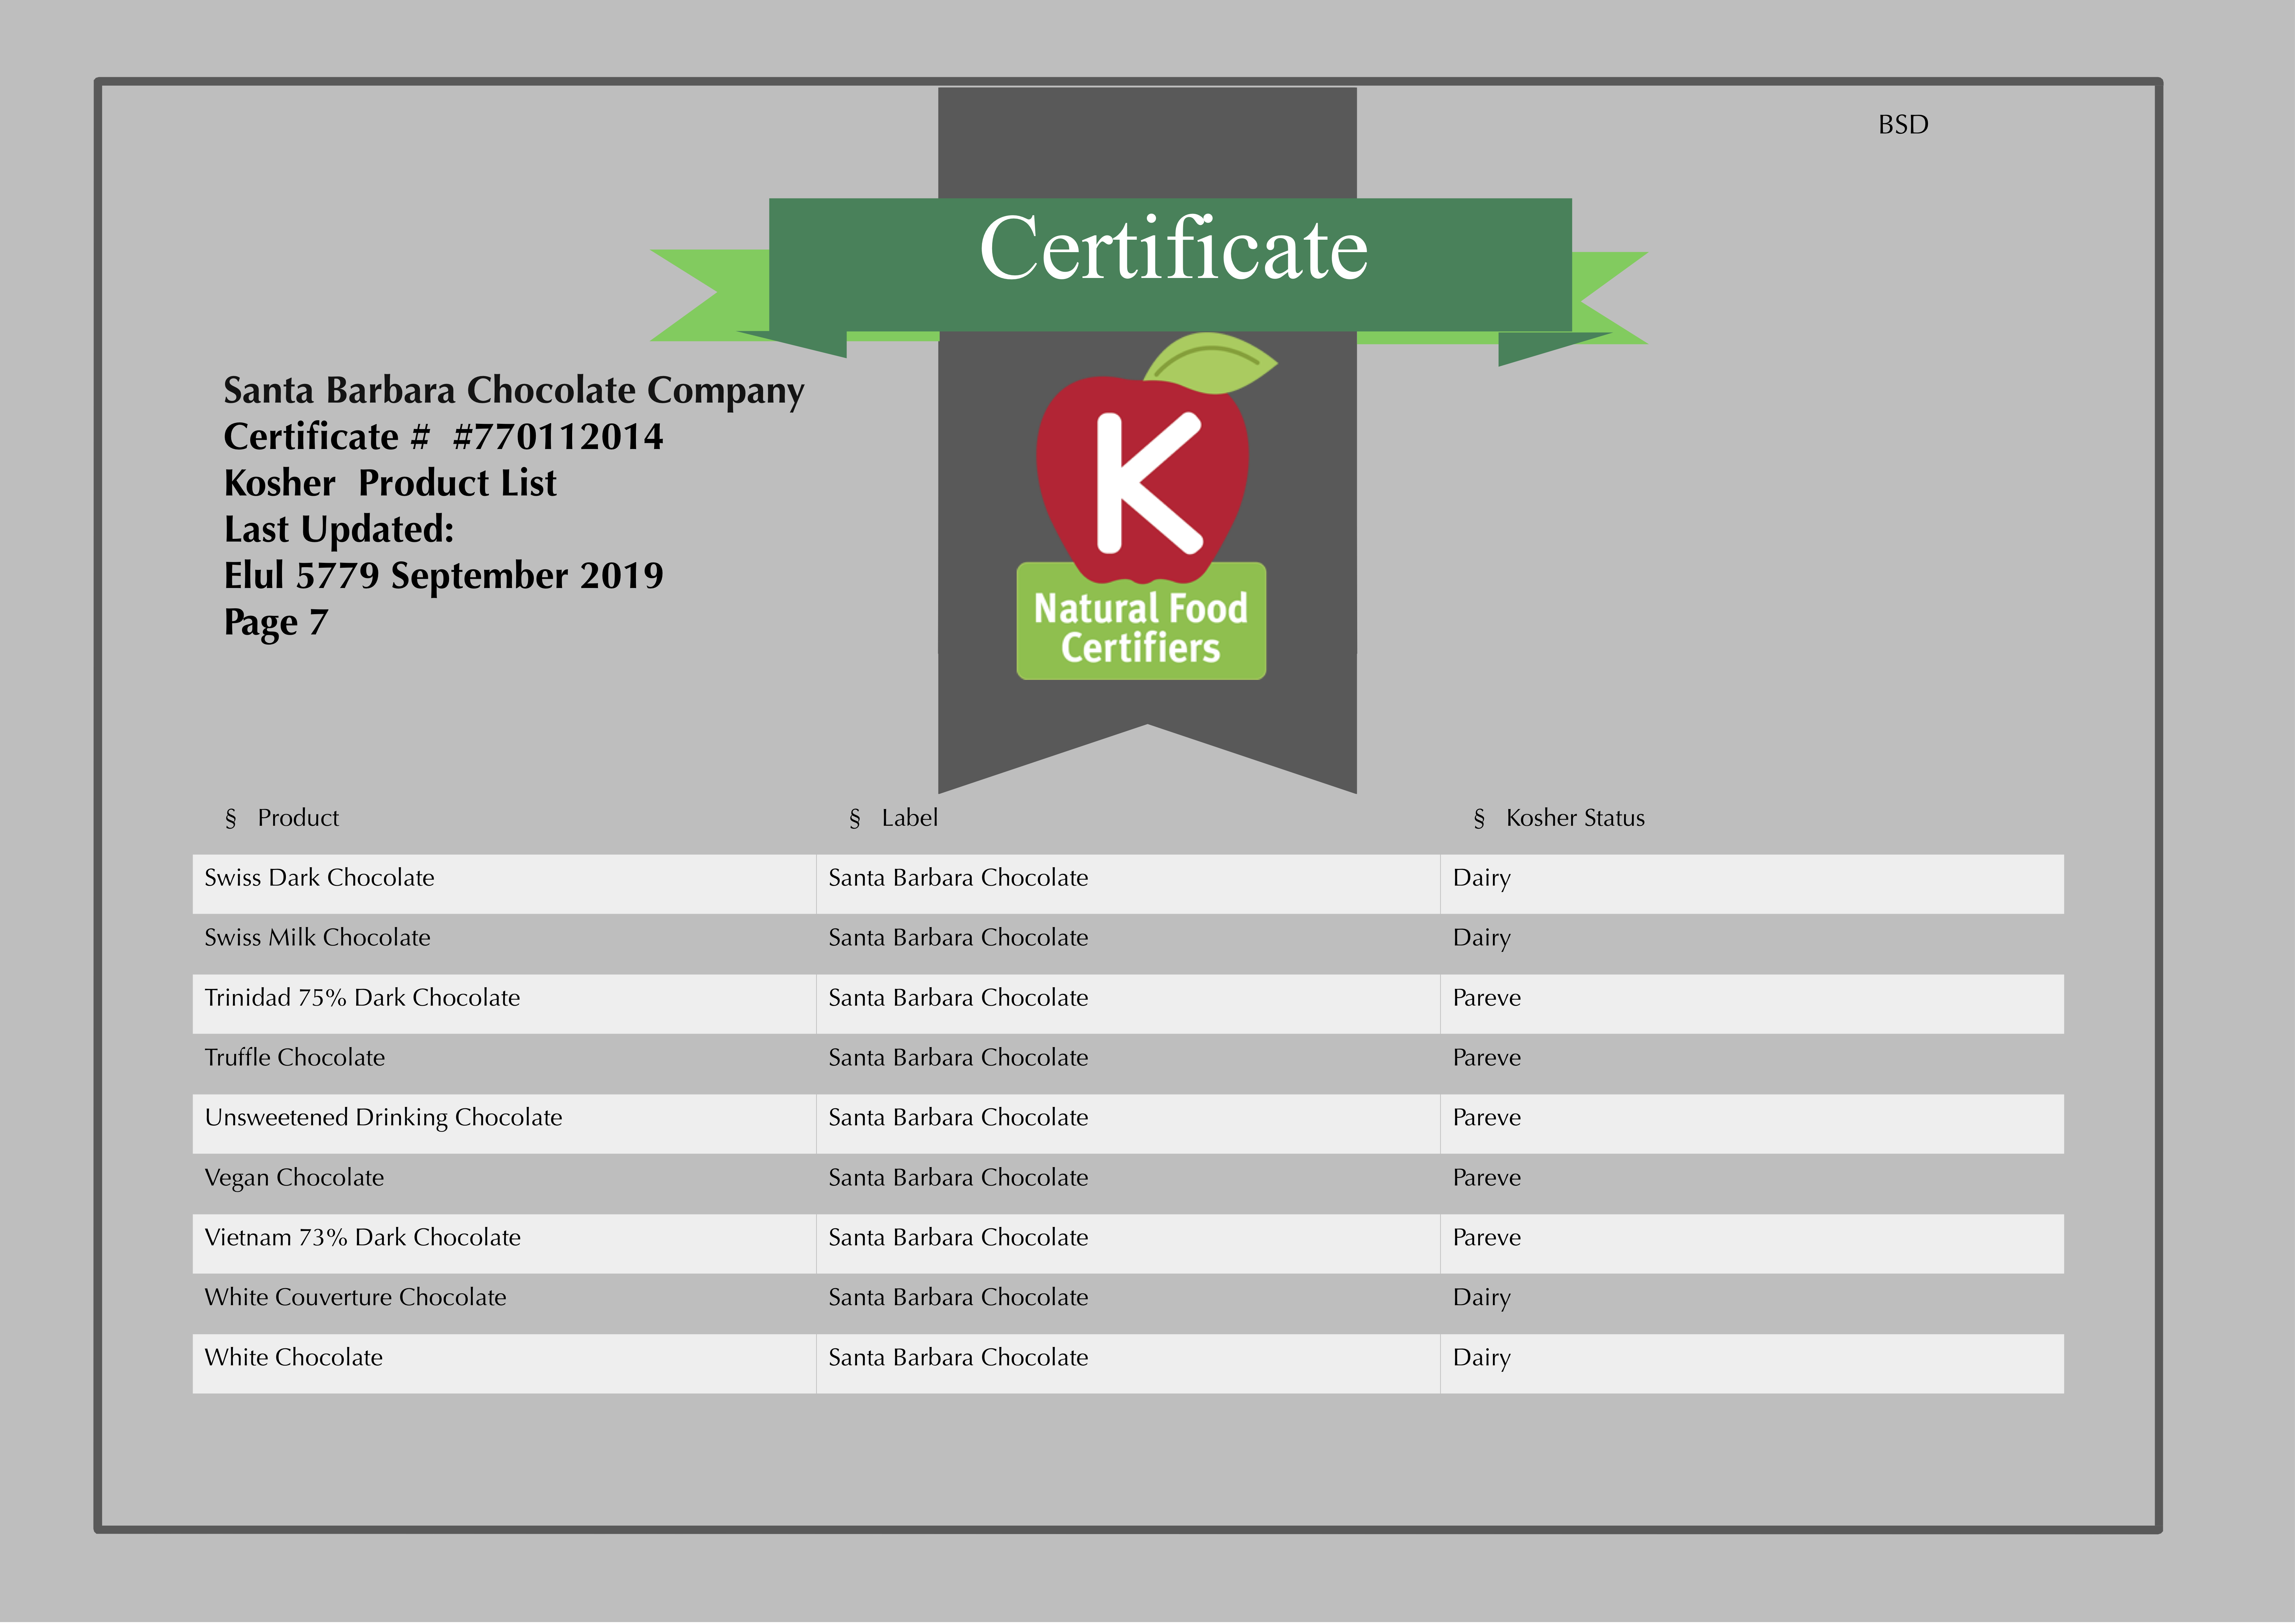 santa-barbara-chocolate-kosher-certificate-2019-2020-page-8.jpg